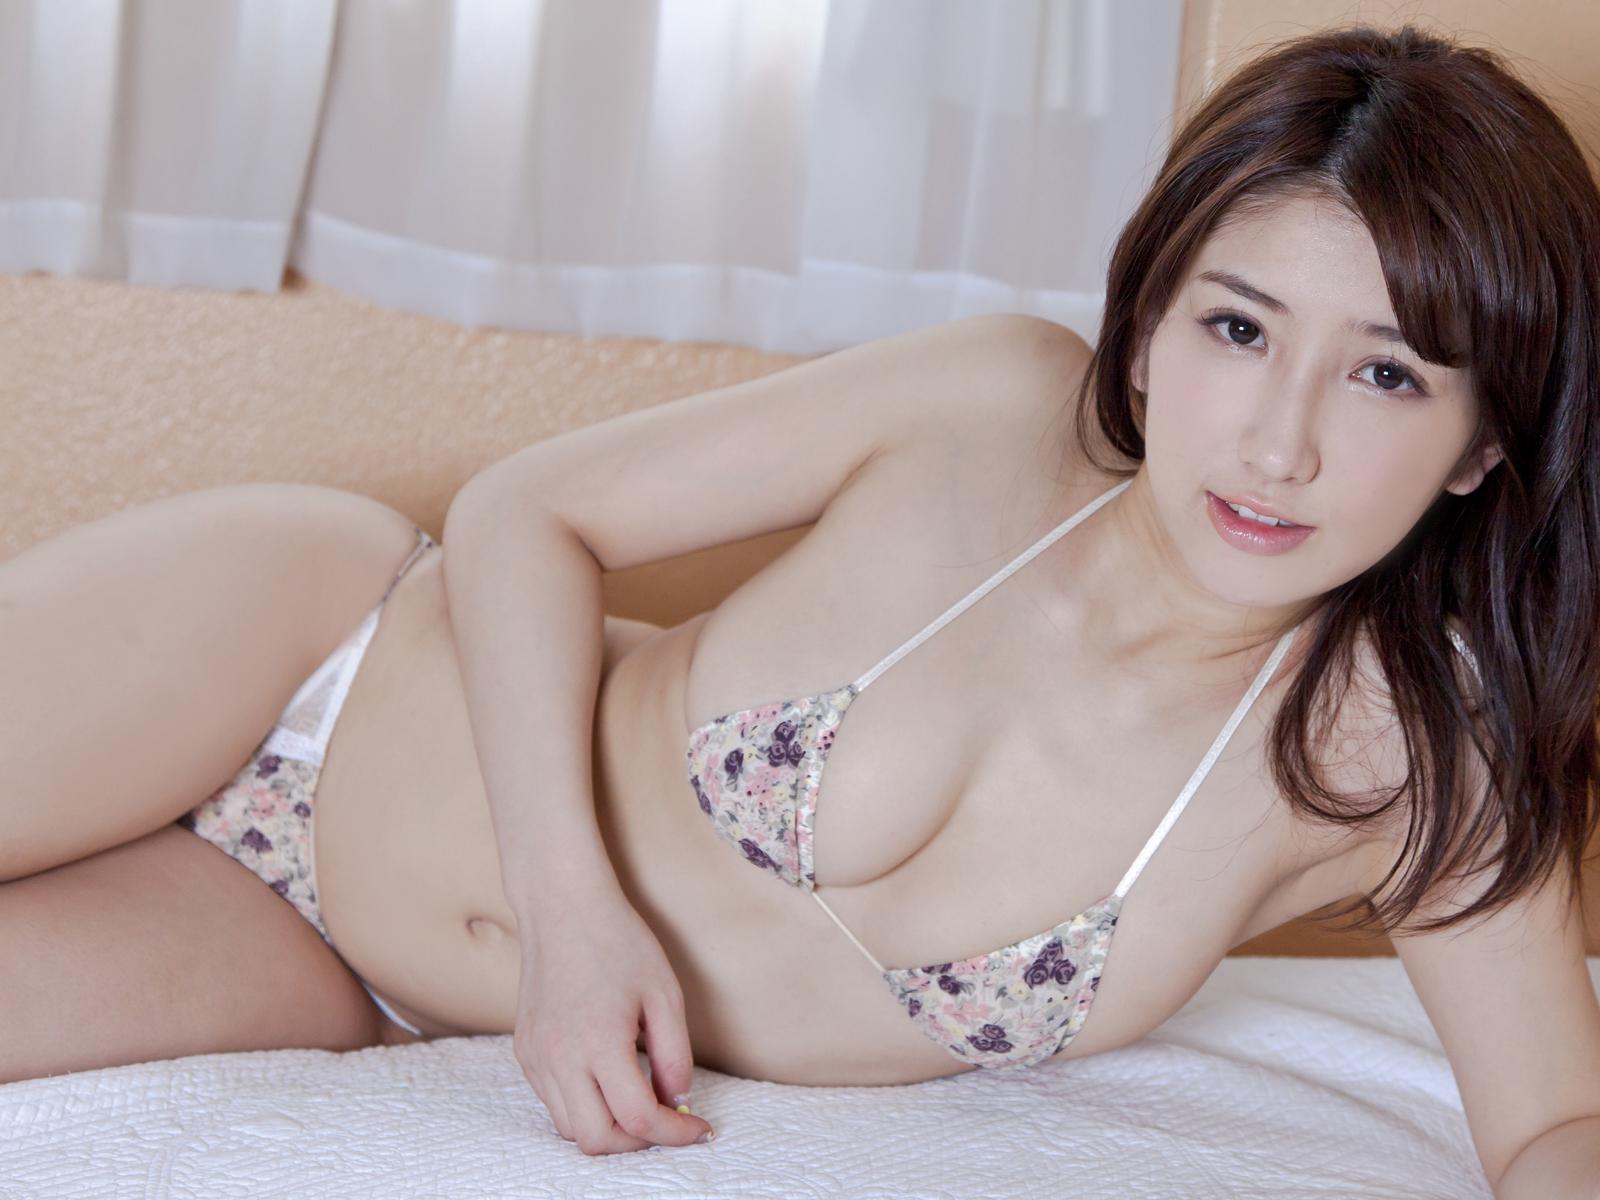 Sabra.net] StrictlyGirl - Arisa